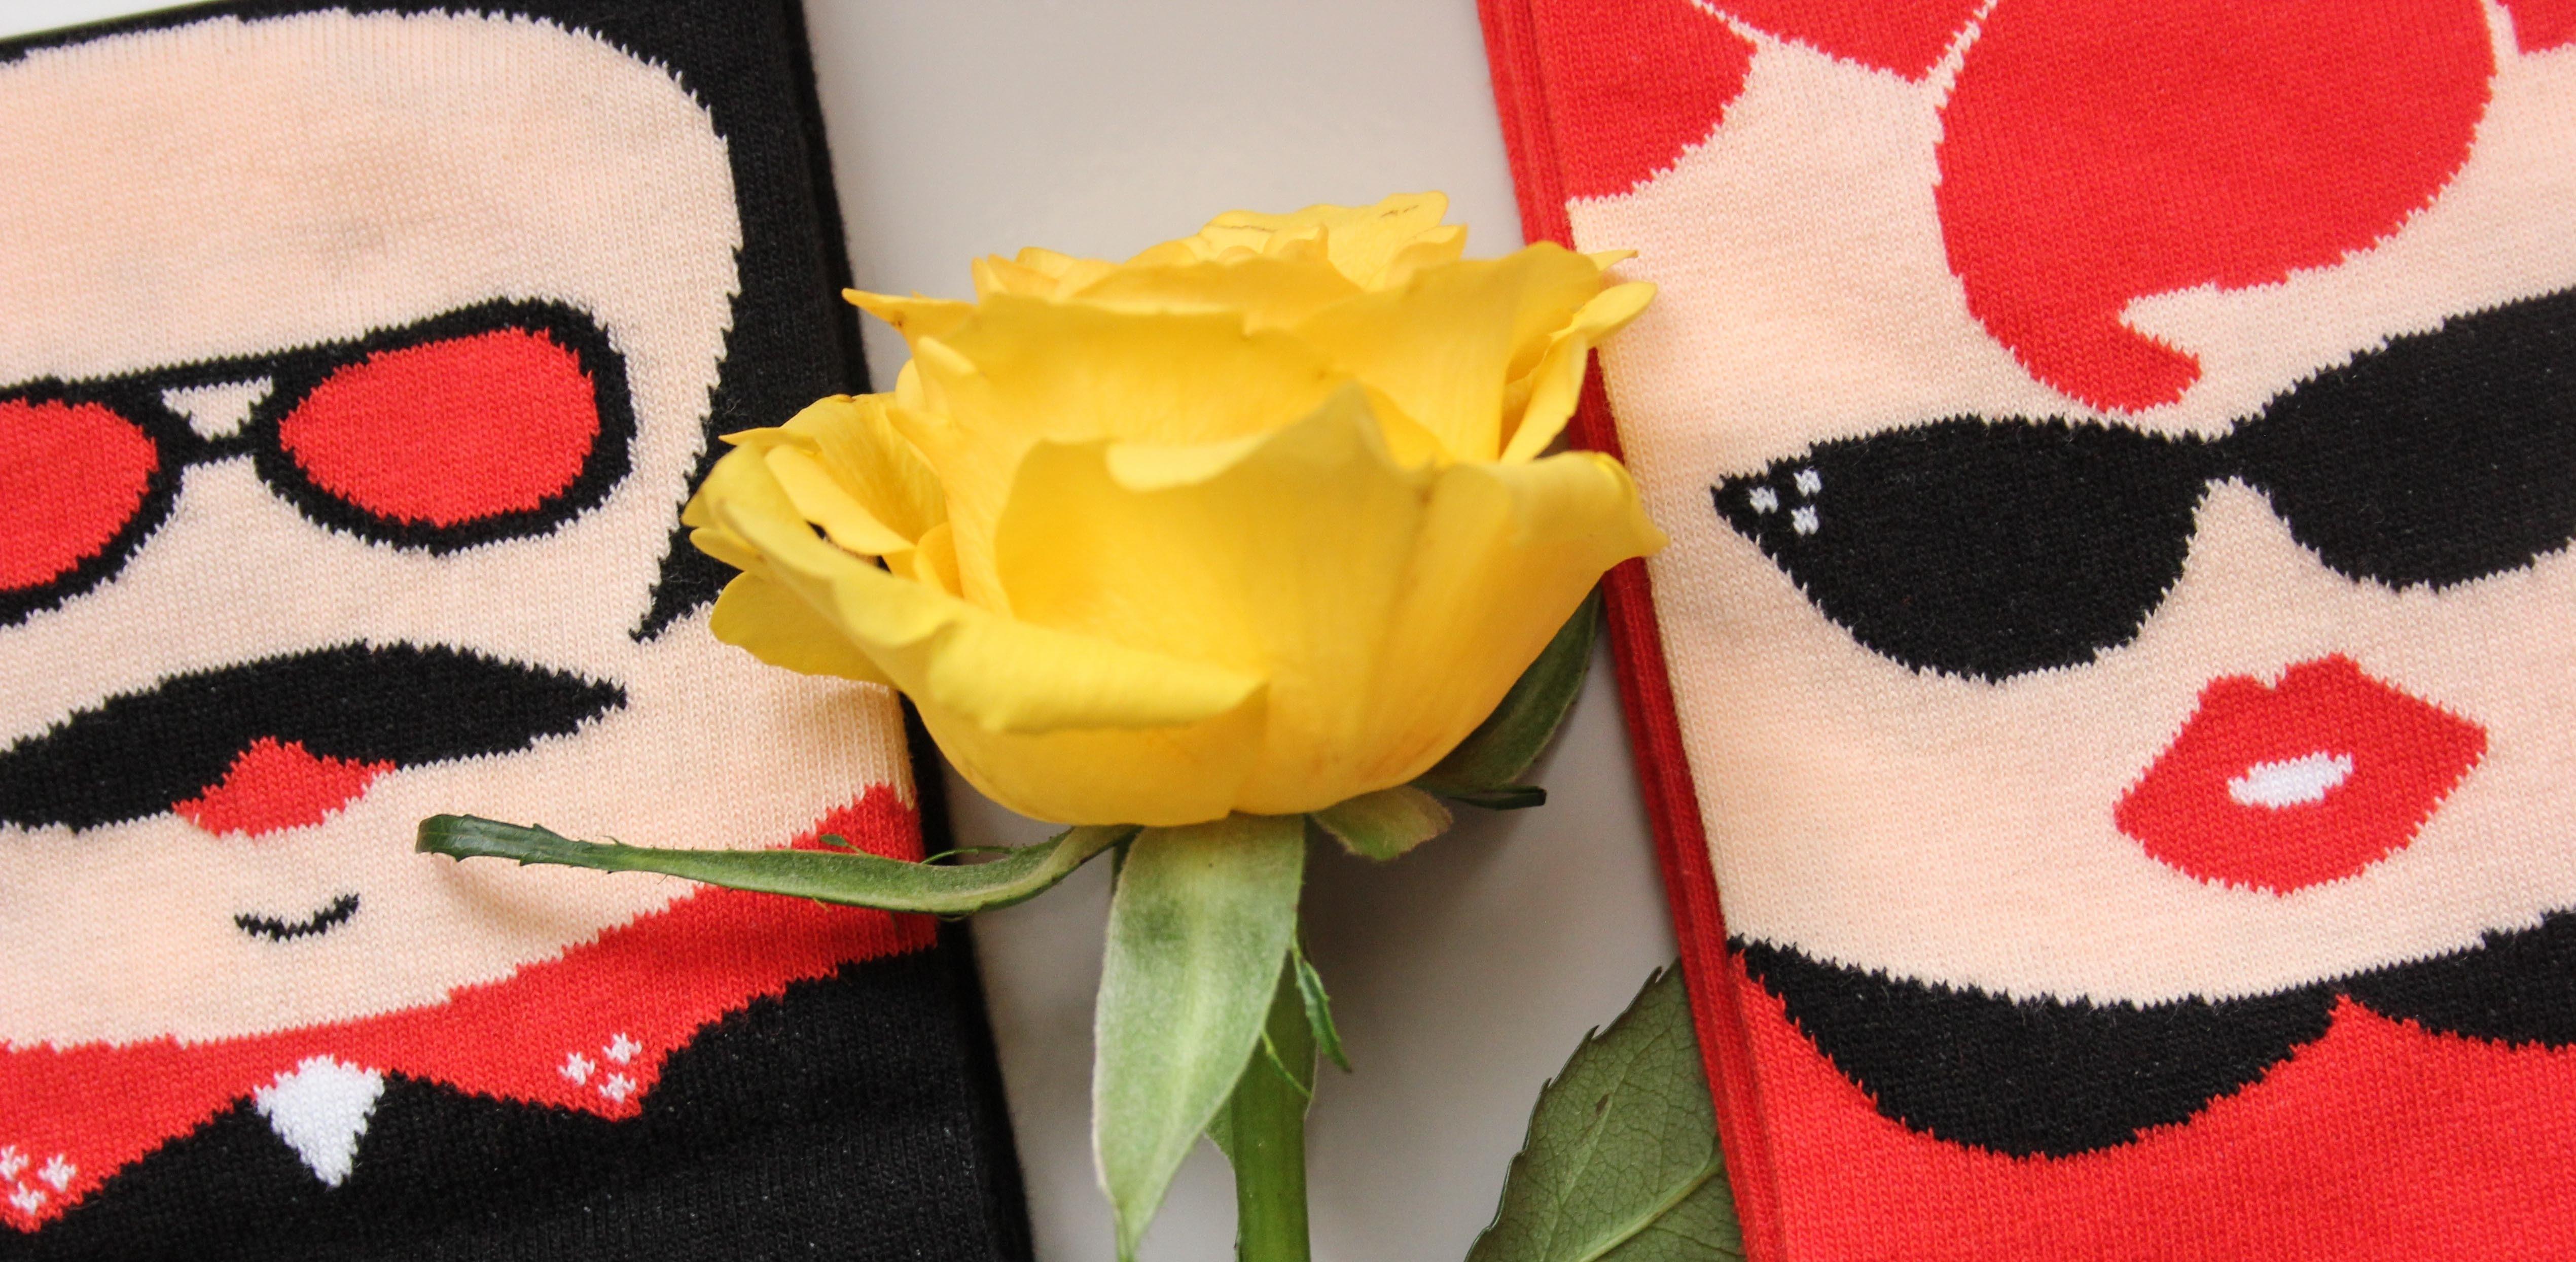 chatty-feet-his-n-hers-valentines-socks-4